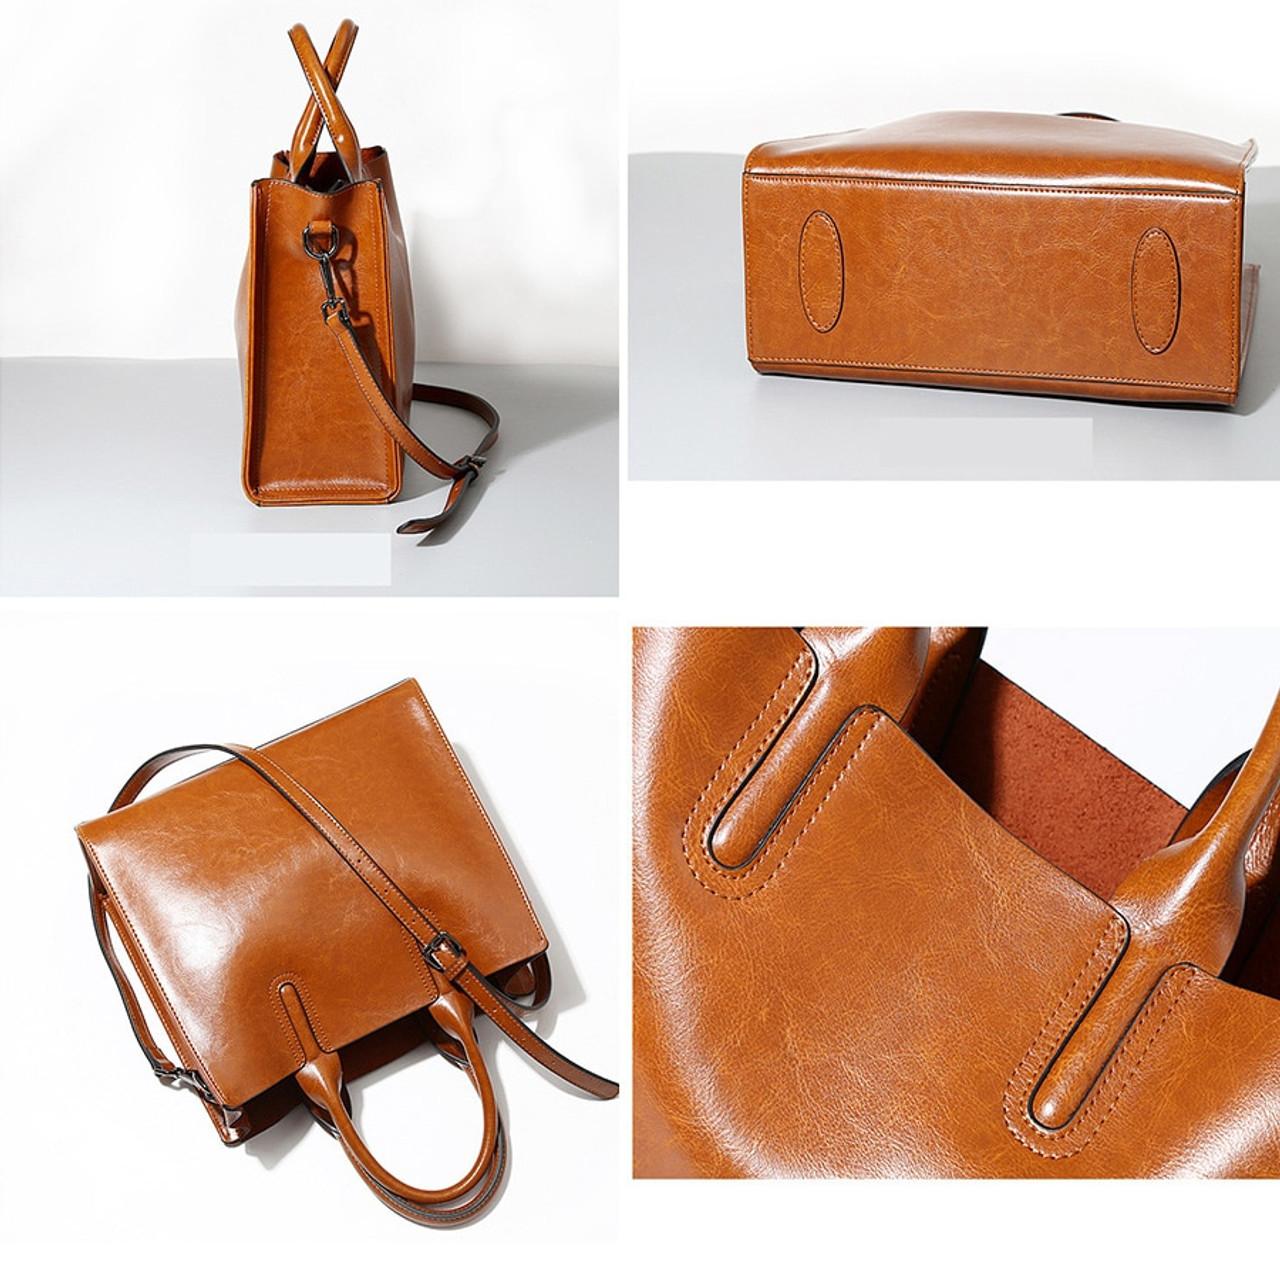 443a1a0b61 ... LAN LOU Genuine Leather Shoulder bag Ladies Vintage HandBags Luxury Women  bag Designer Brand Bags for ...